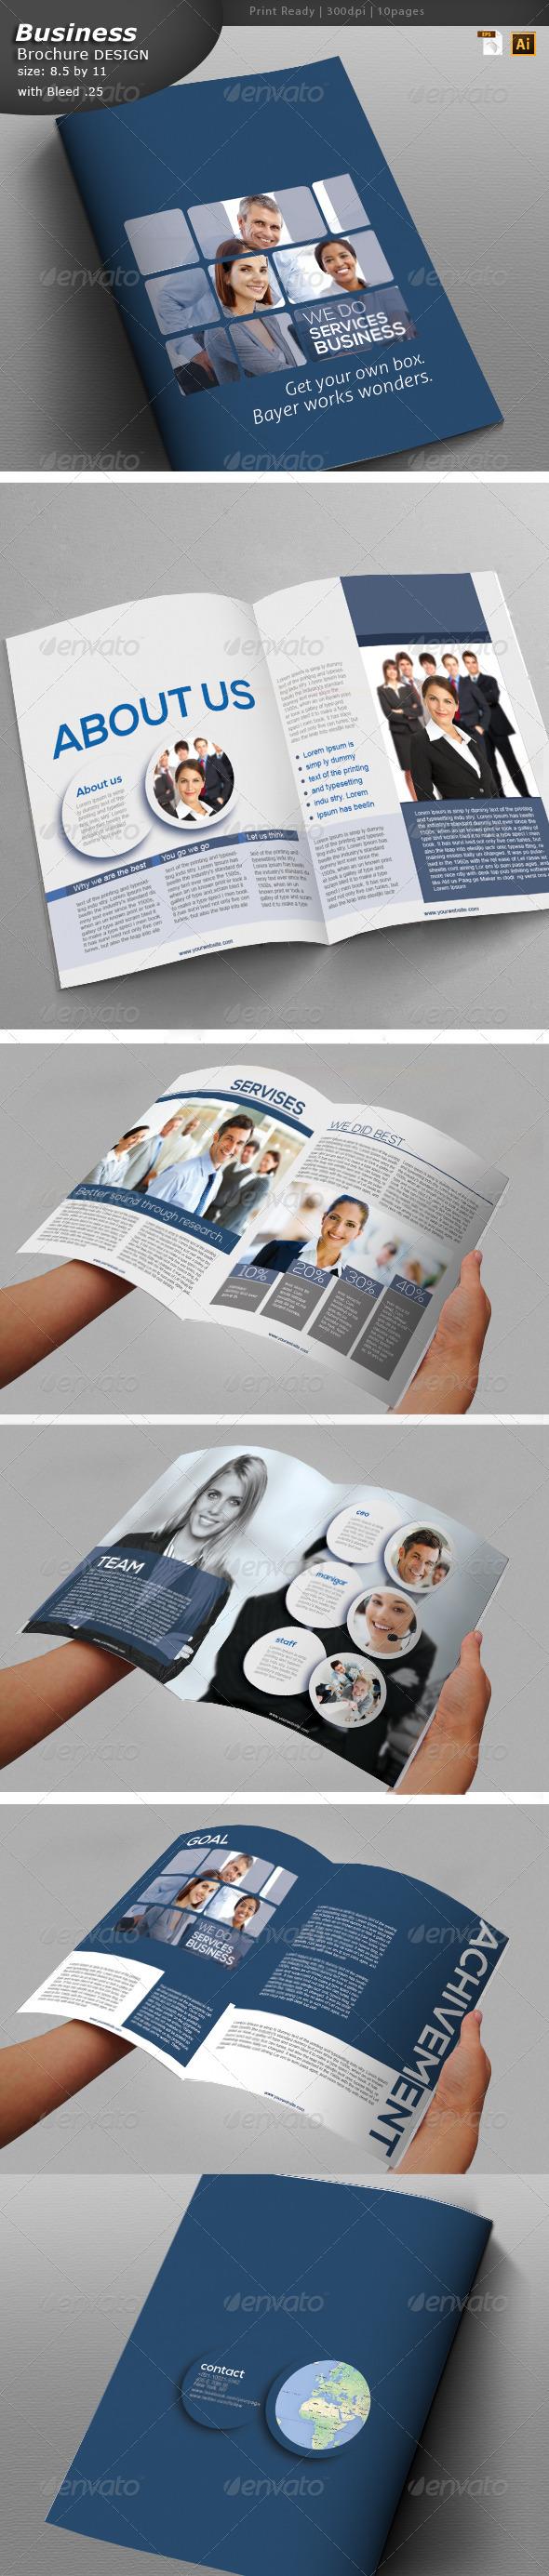 GraphicRiver Business Brochure Design 6140304